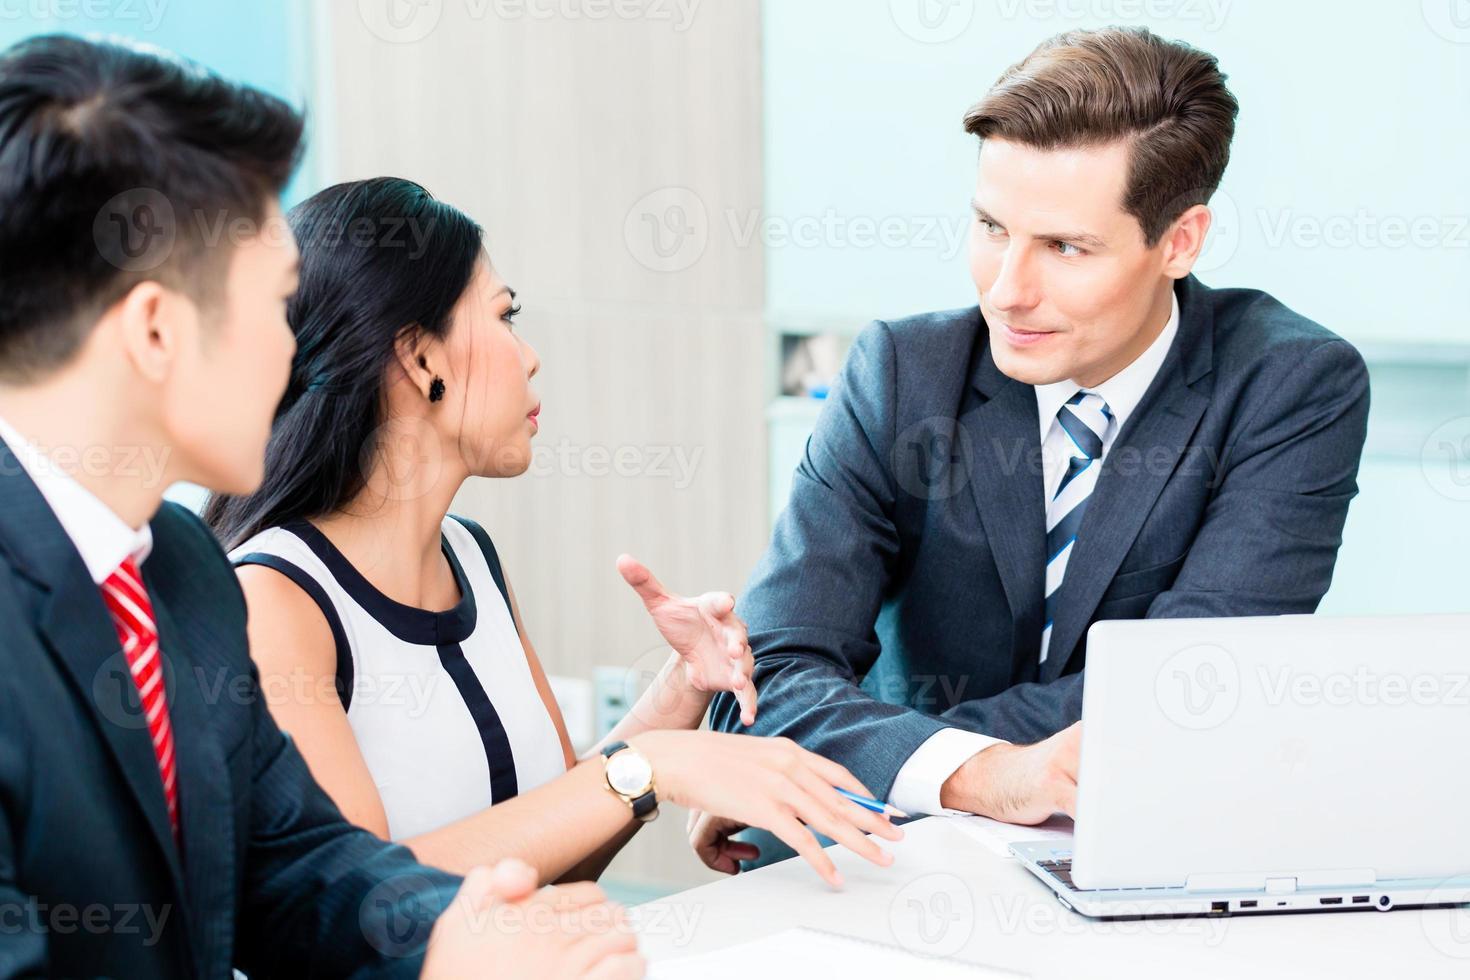 Geschäftsleute diskutieren Projekt im Büro foto